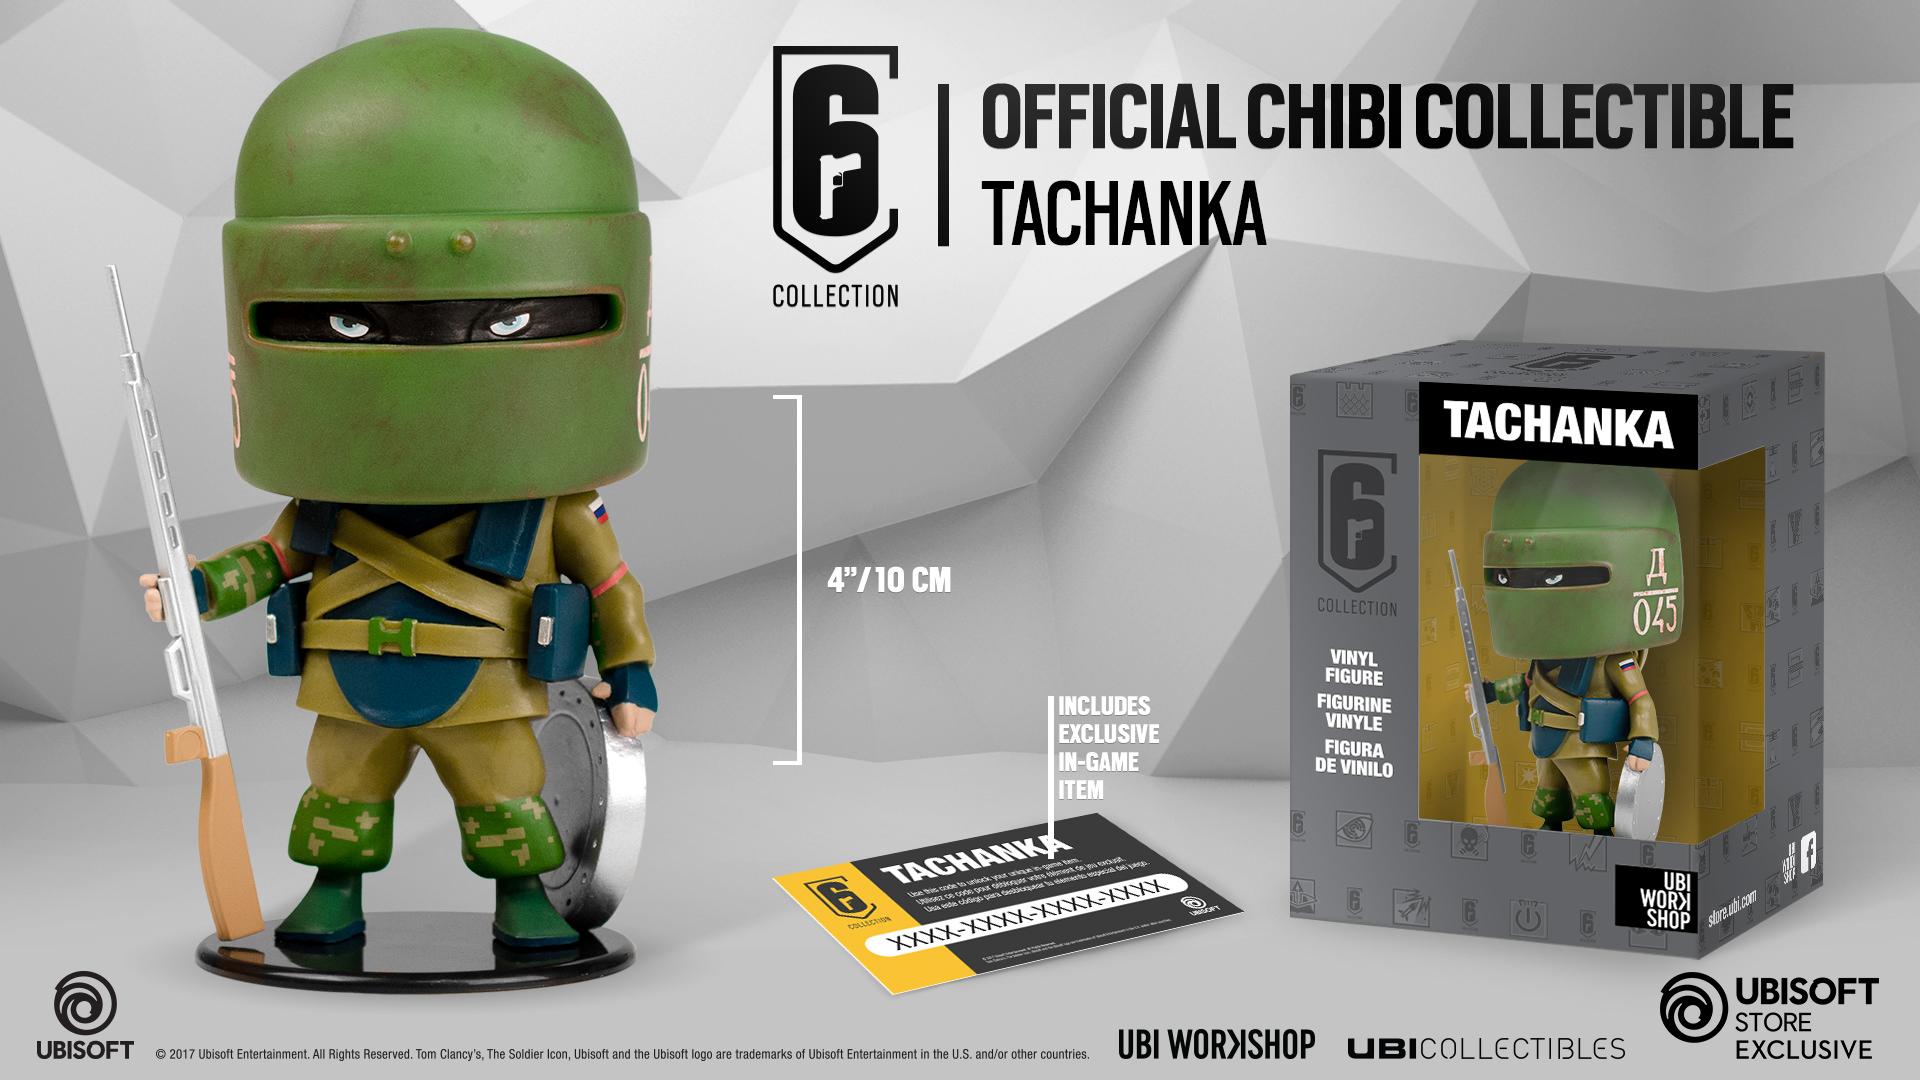 ubisoft chibi  Six Collection - Tachanka Chibi Figurine